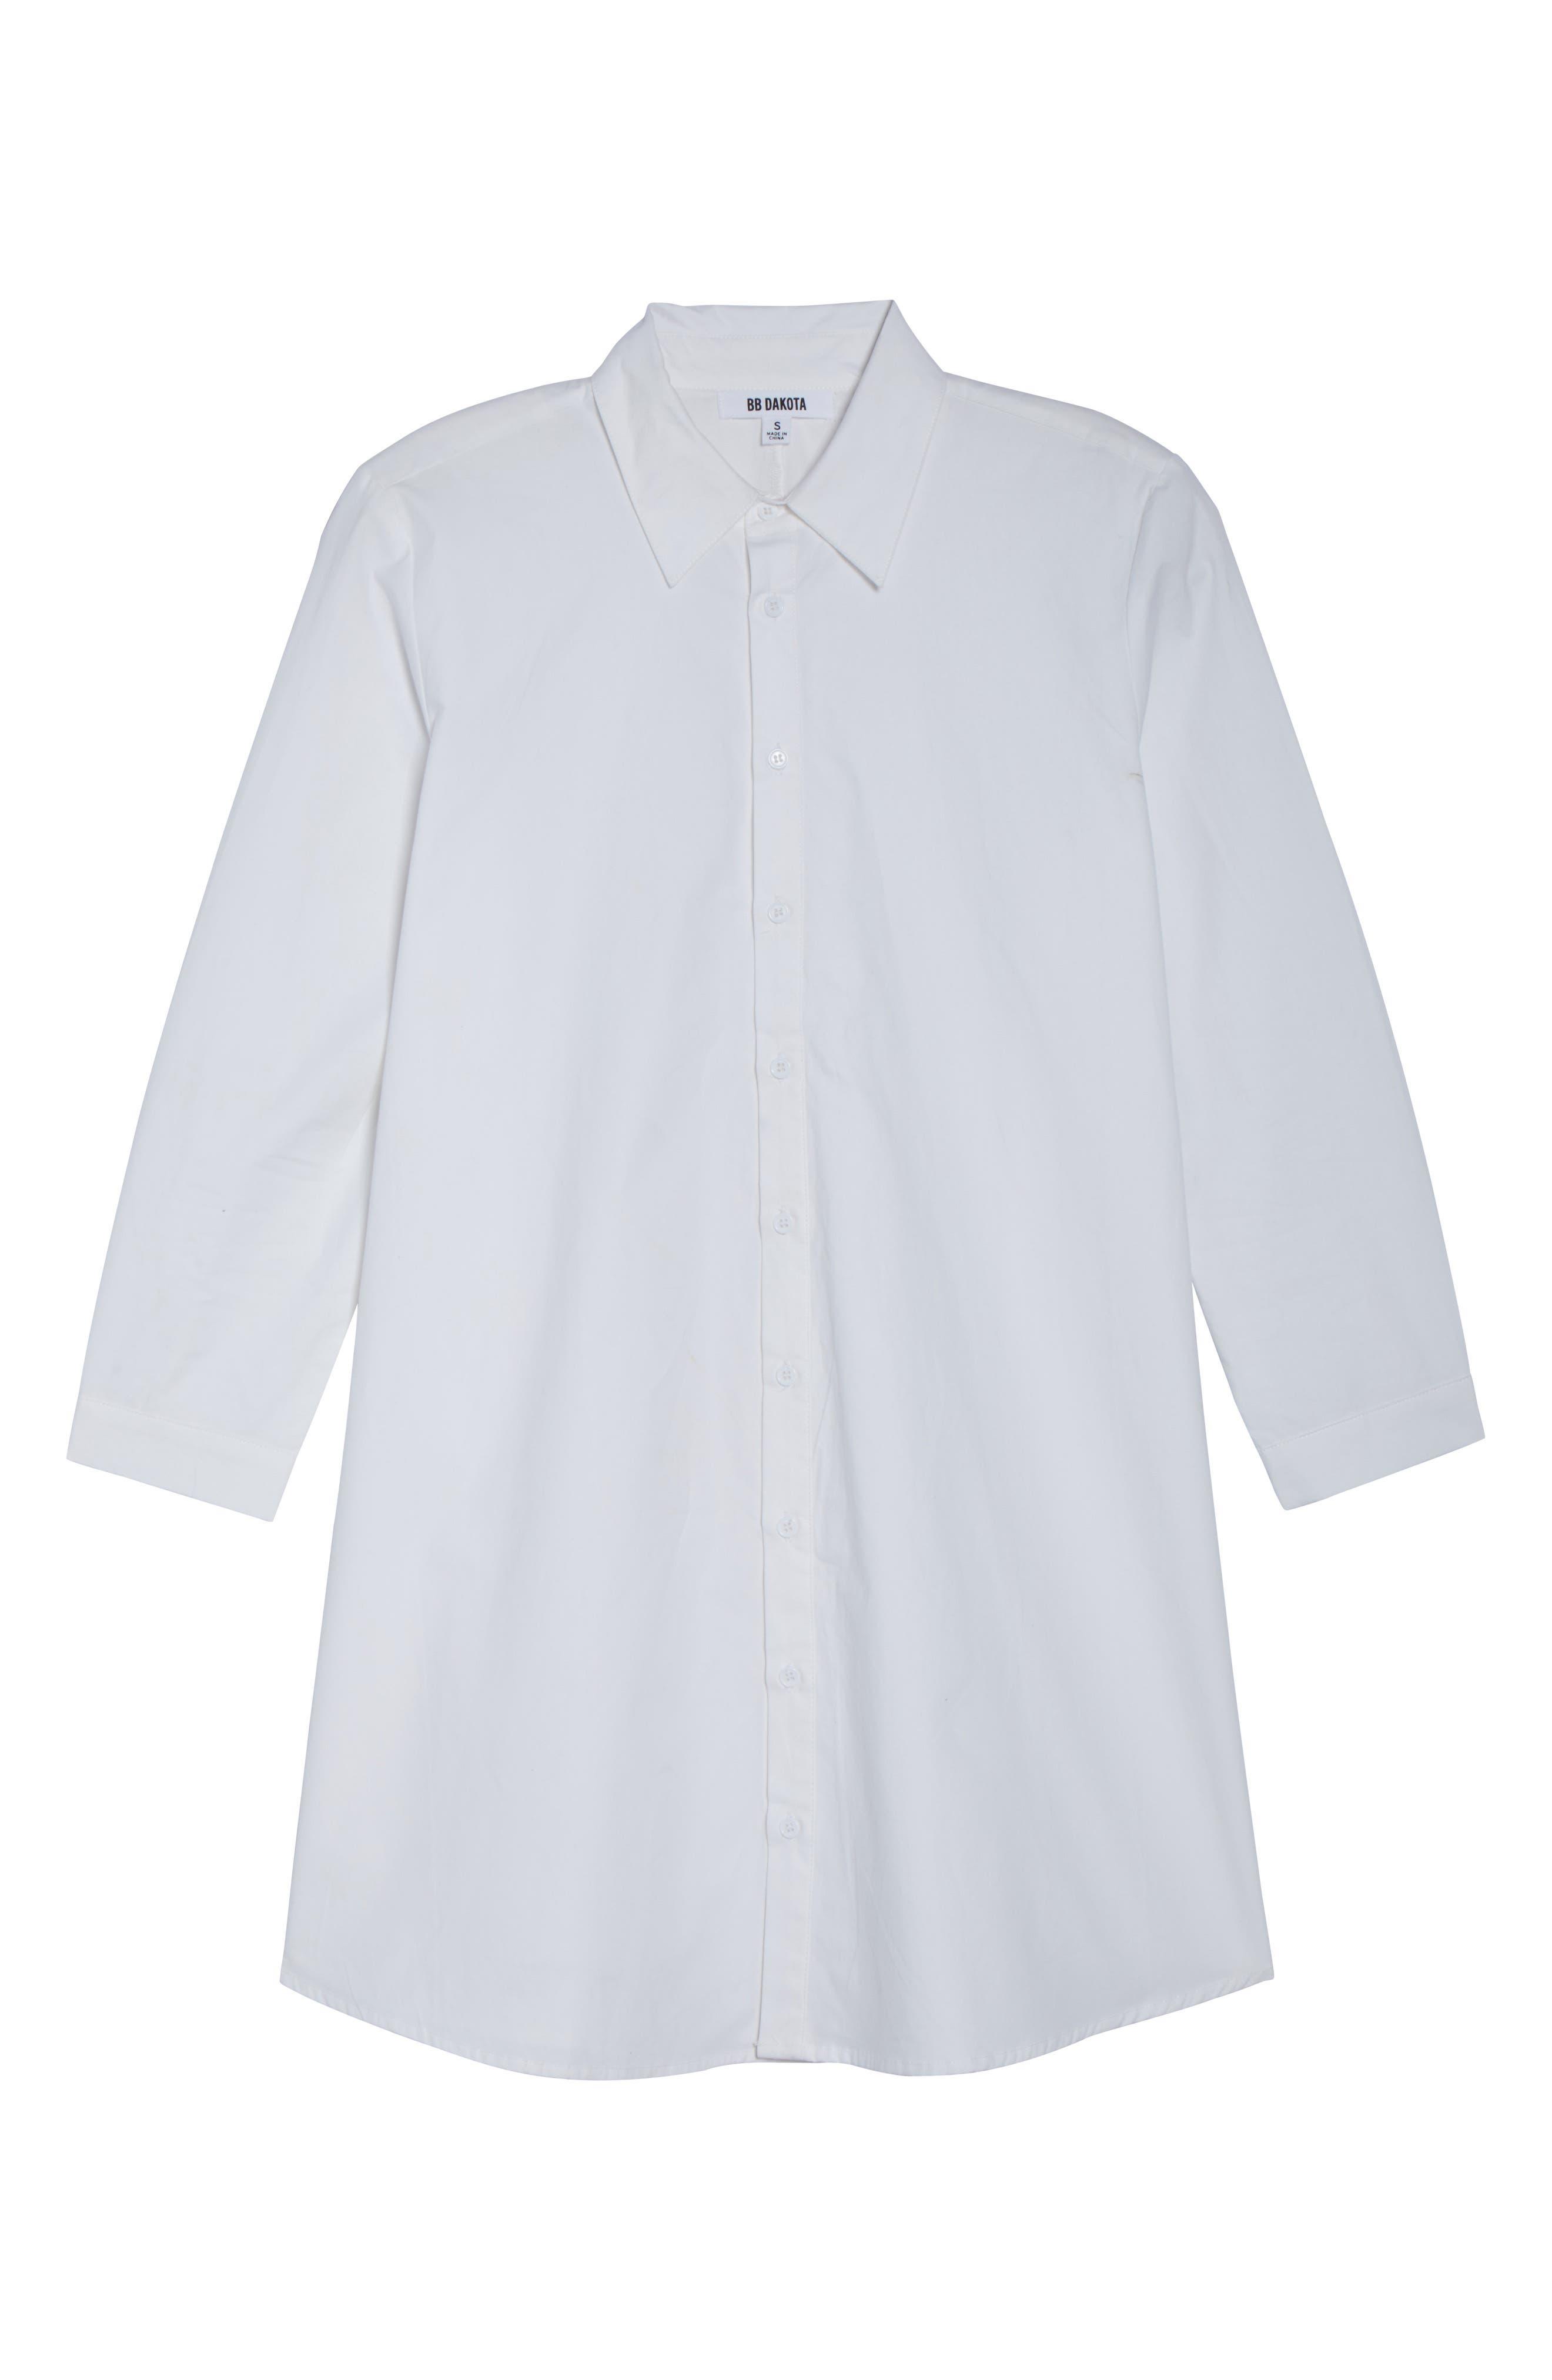 Colt Cotton Poplin Shirtdress,                             Alternate thumbnail 6, color,                             Optic White